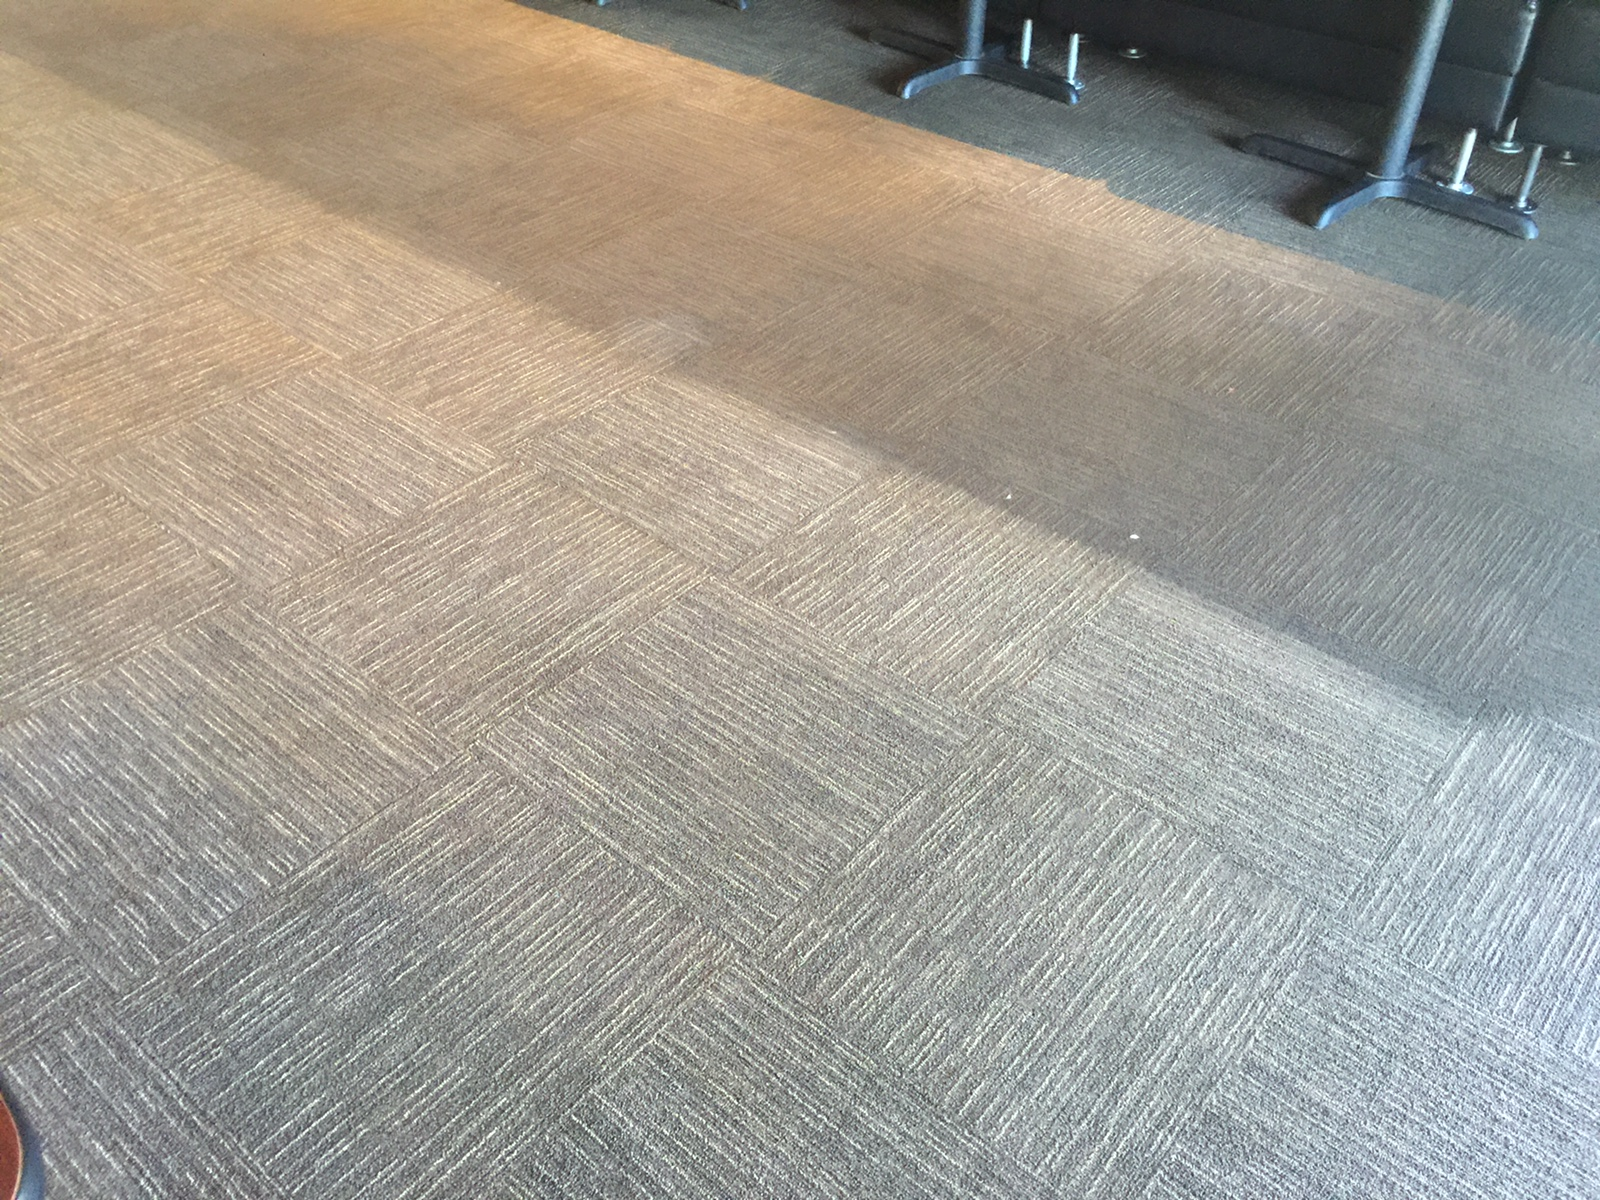 Restaurant Carpet Cleaning Kalamazoo